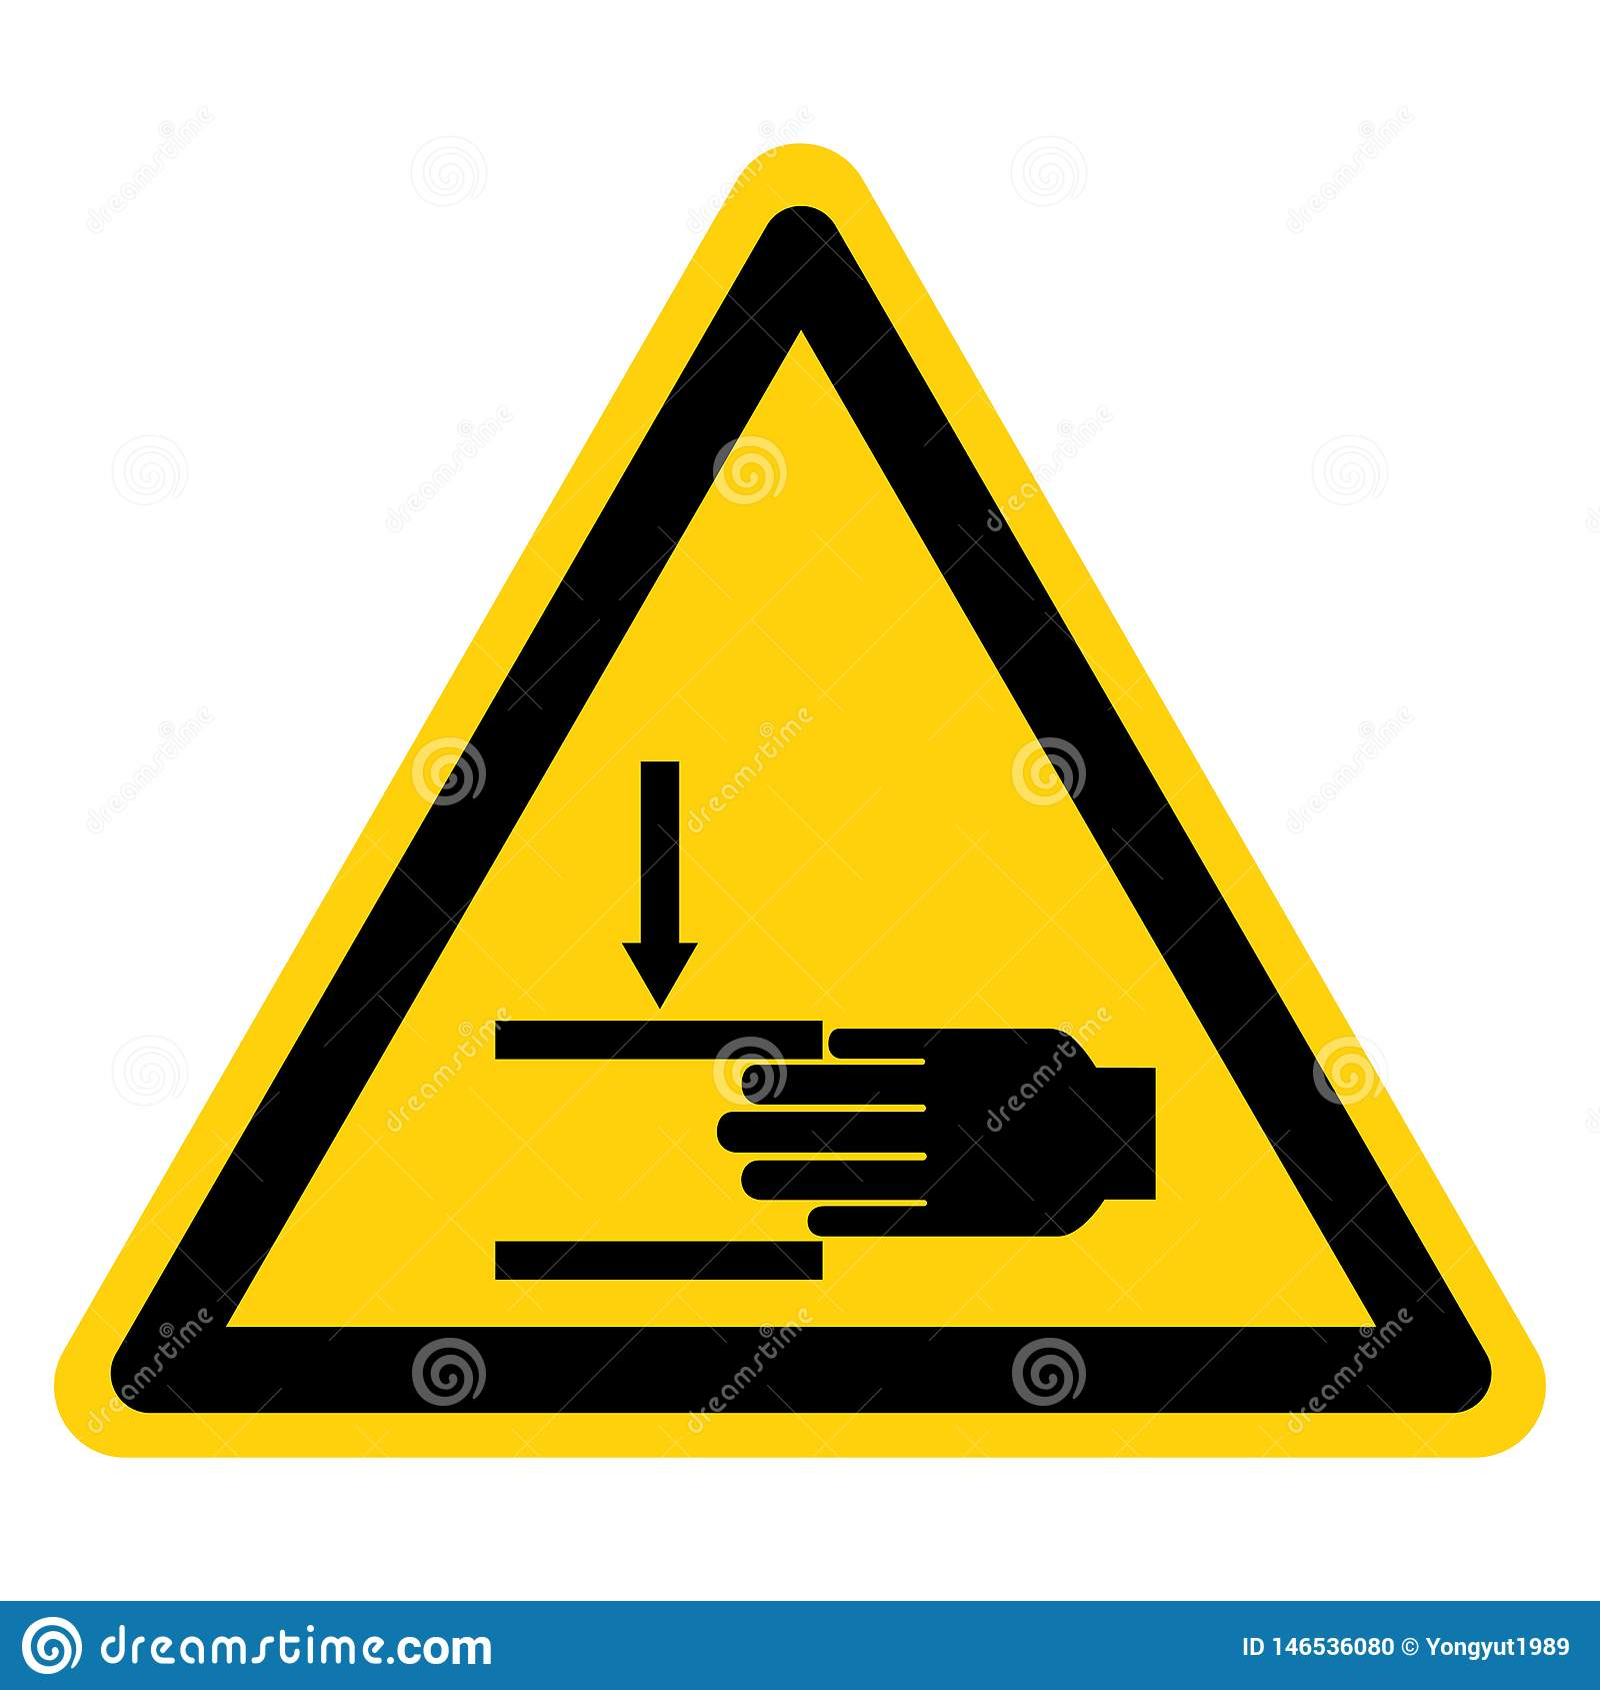 A m?o esmaga a for?a de cima do sinal do s?mbolo, ilustra??o do vetor, isolado na etiqueta branca do fundo EPS10